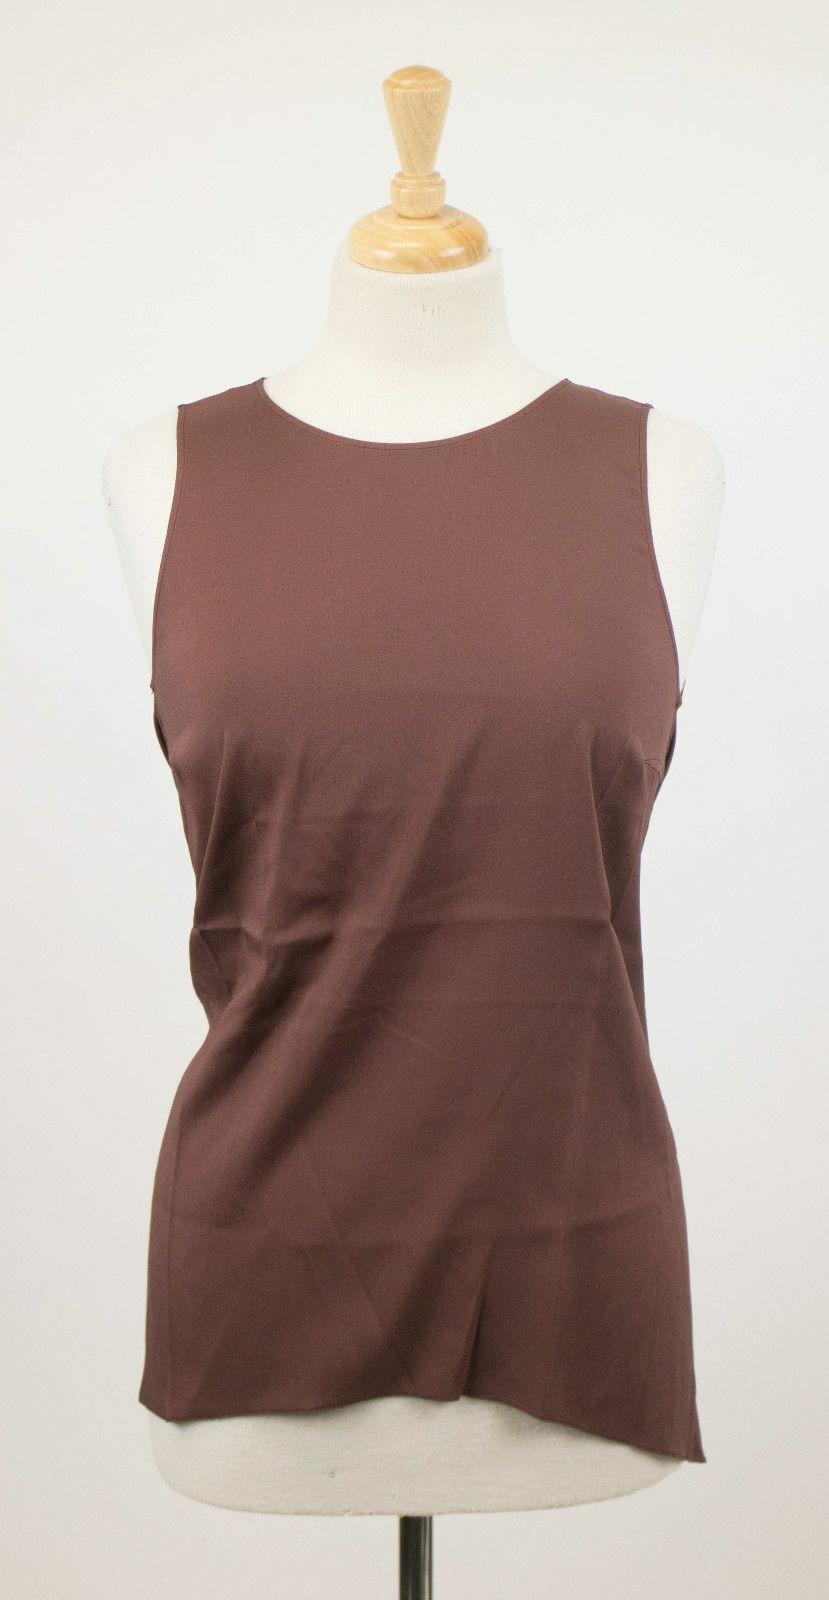 NWT BRUNELLO CUCINELLI Woman's Brown Silk Blend Blouse Shirt Top Size XL